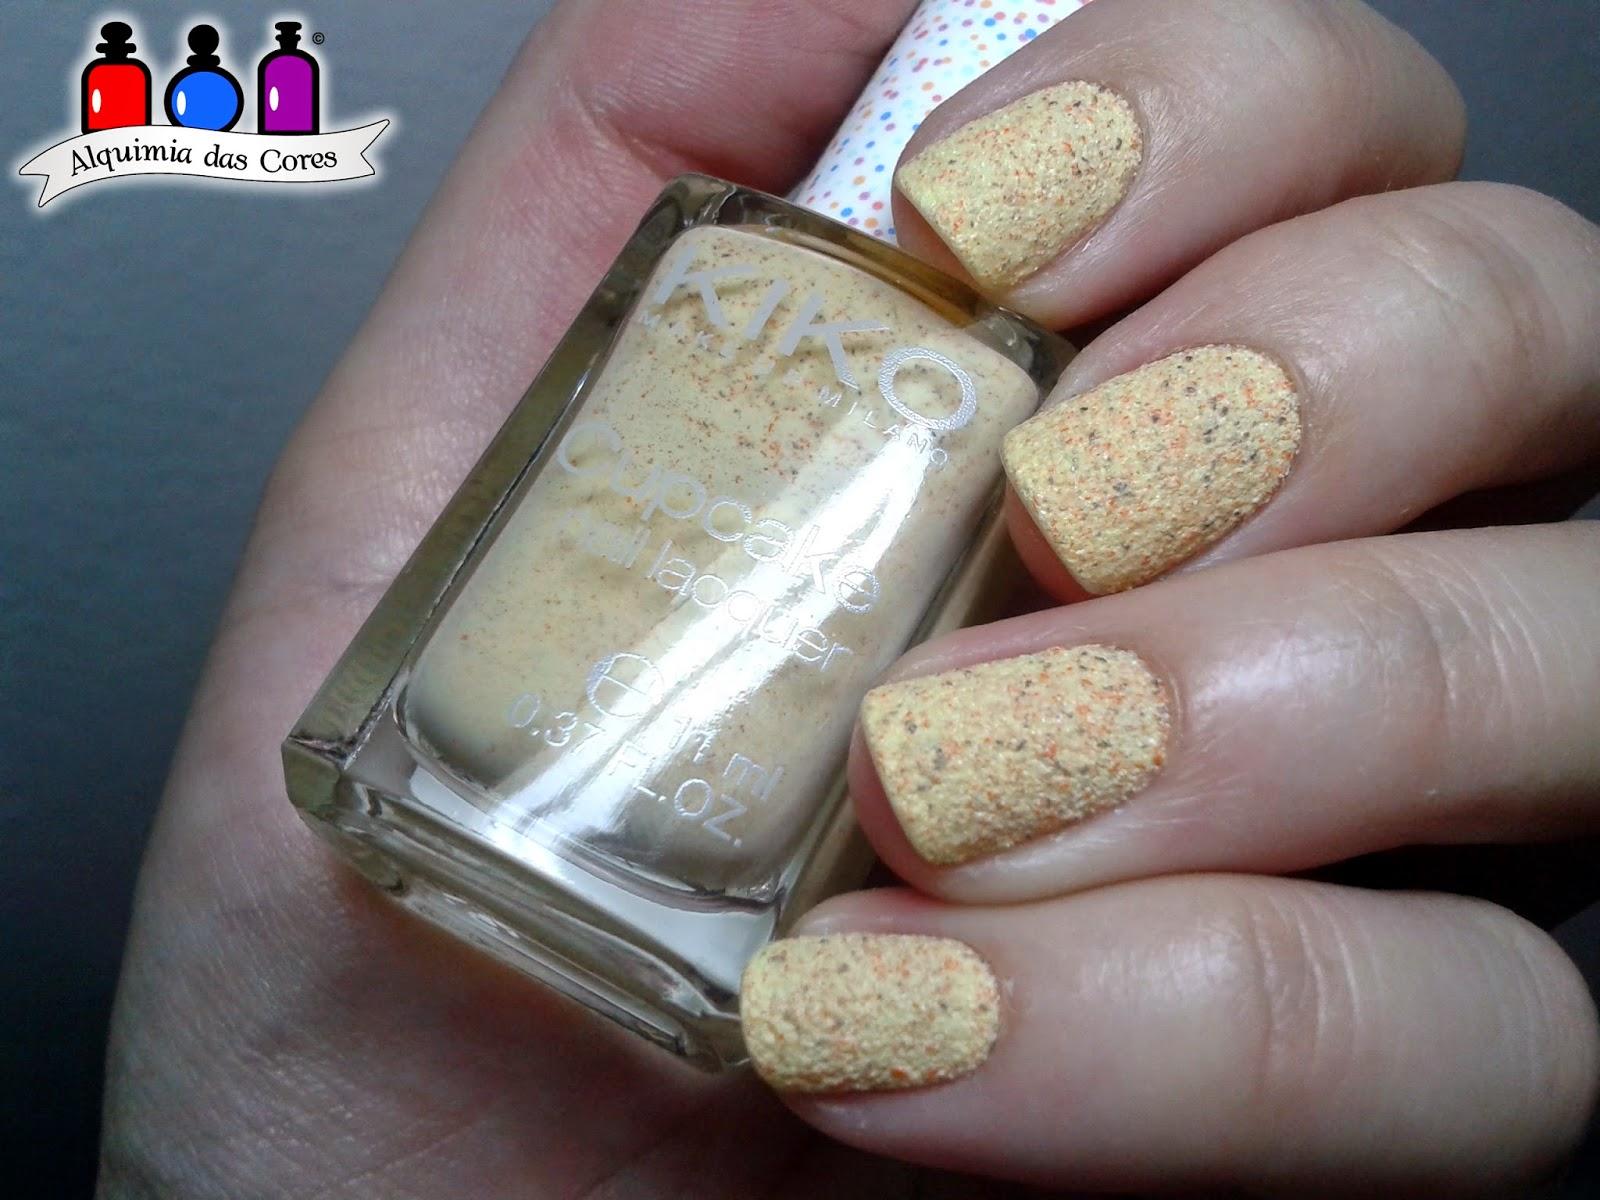 648, Kiko, pineapple, amarelo, texturizado, importado, carimbada, carimbo, DRK, esmalte, nail polish, sand, liquid sand